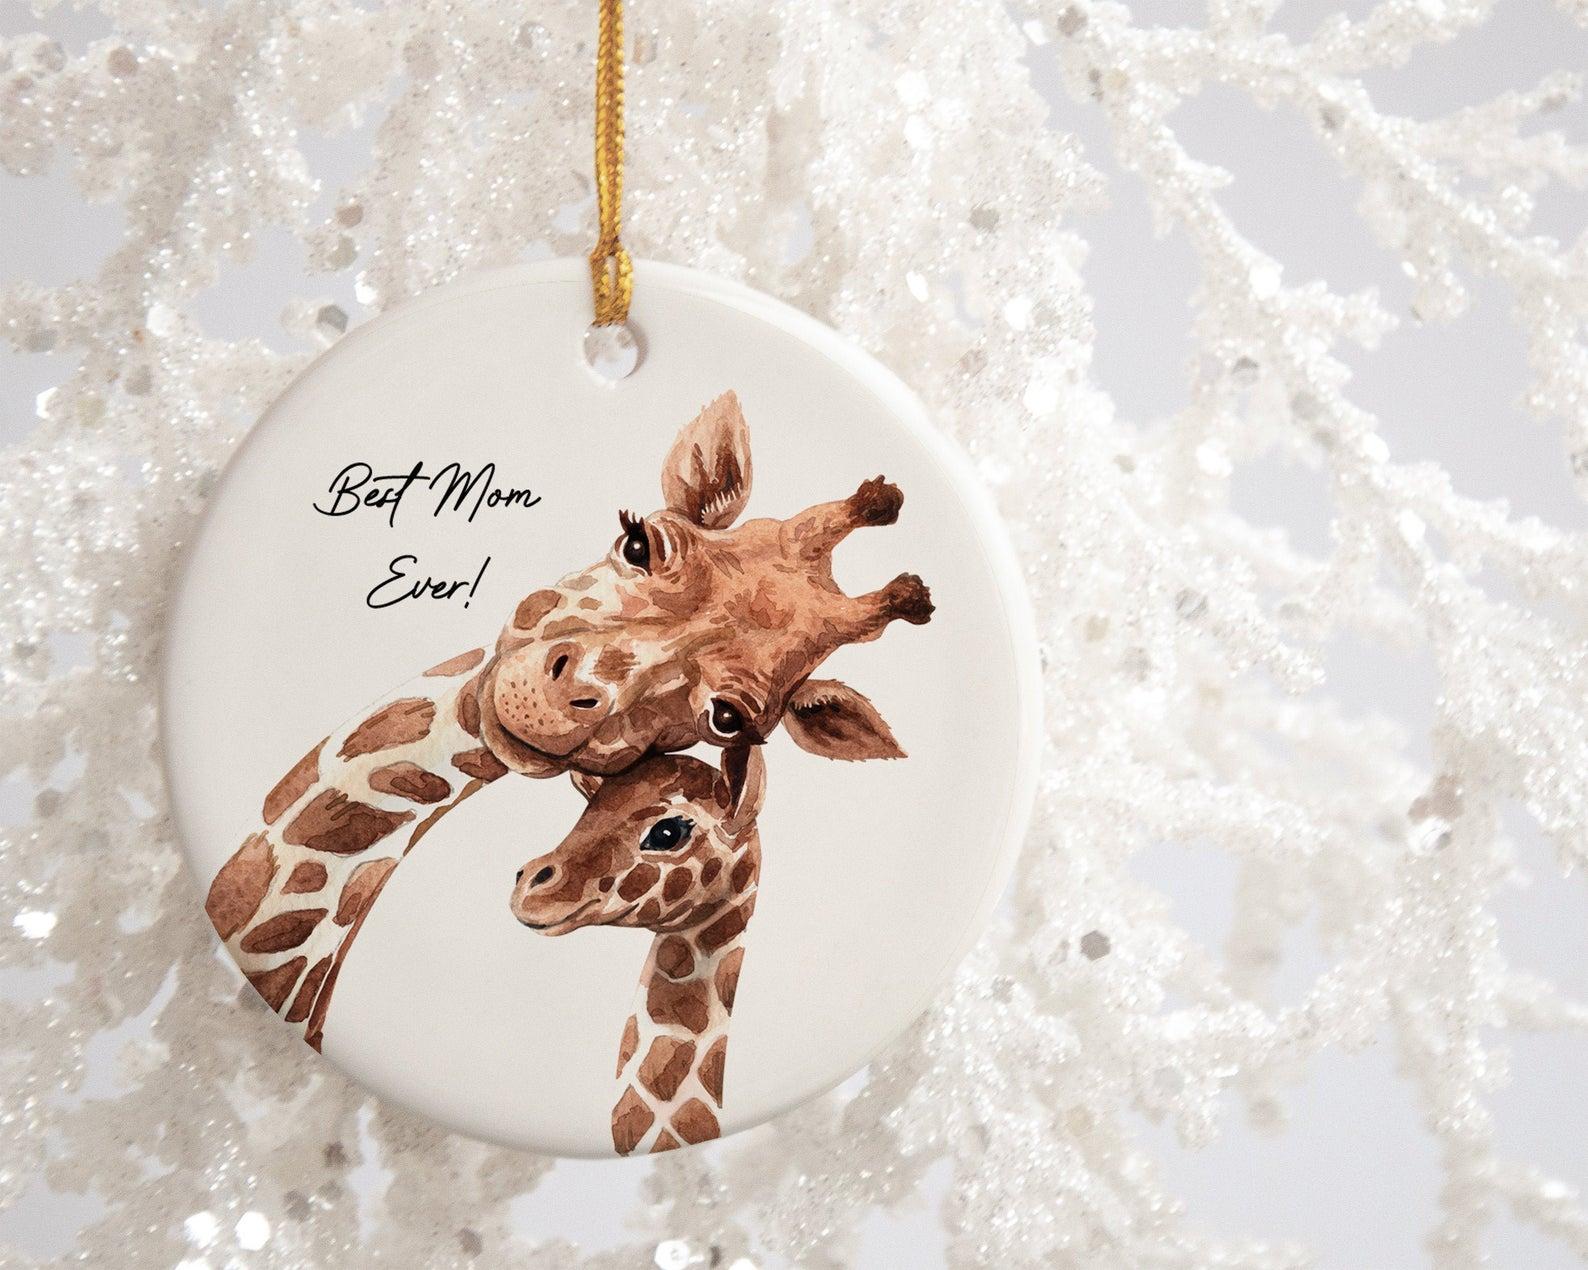 giraffe-gifts-christmas-ornament